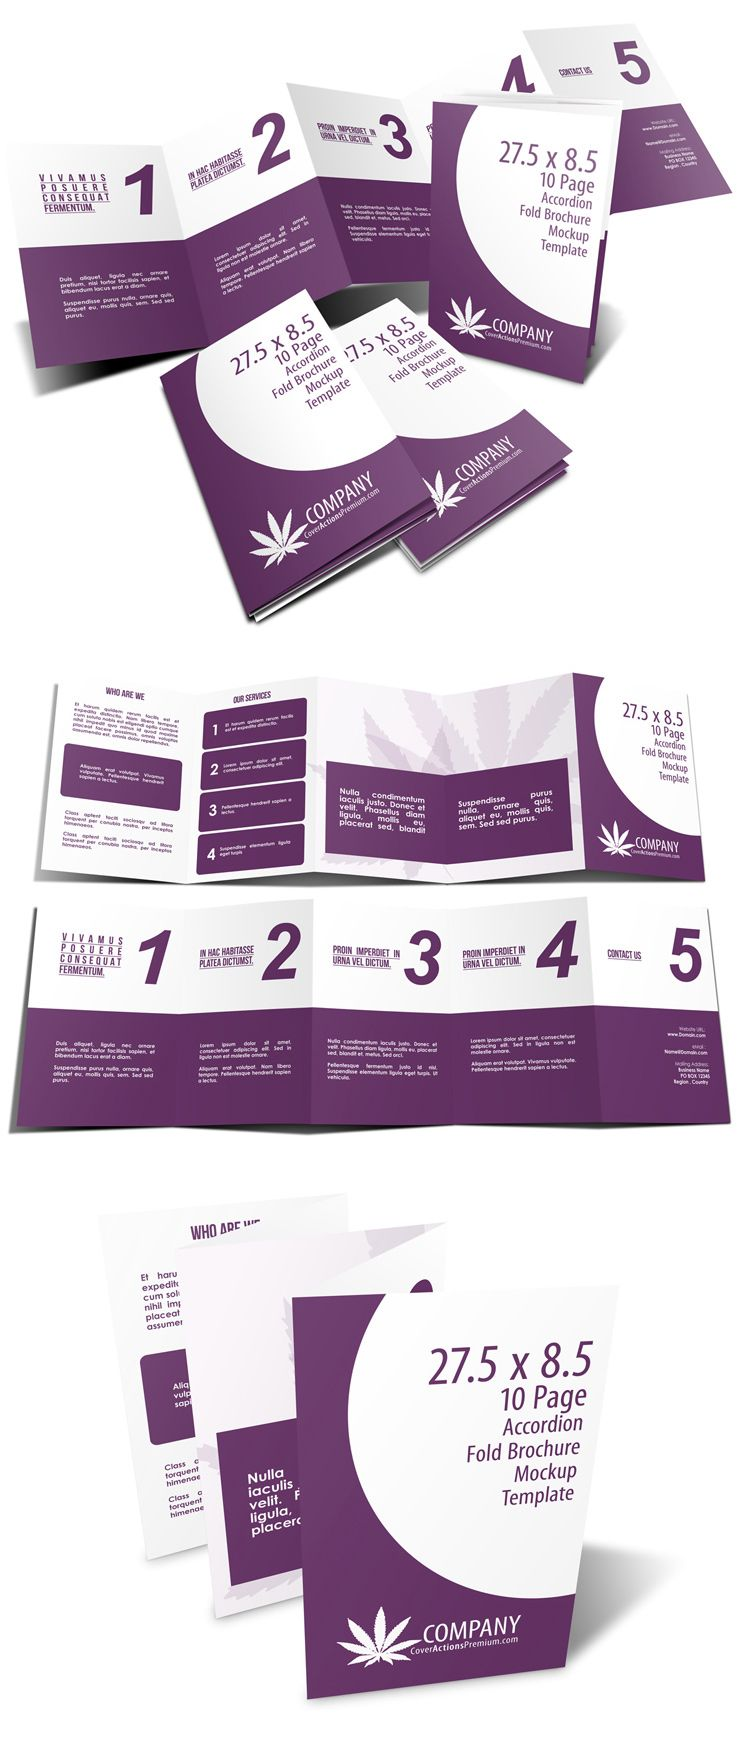 5 Panel Accordion Fold Brochure Template